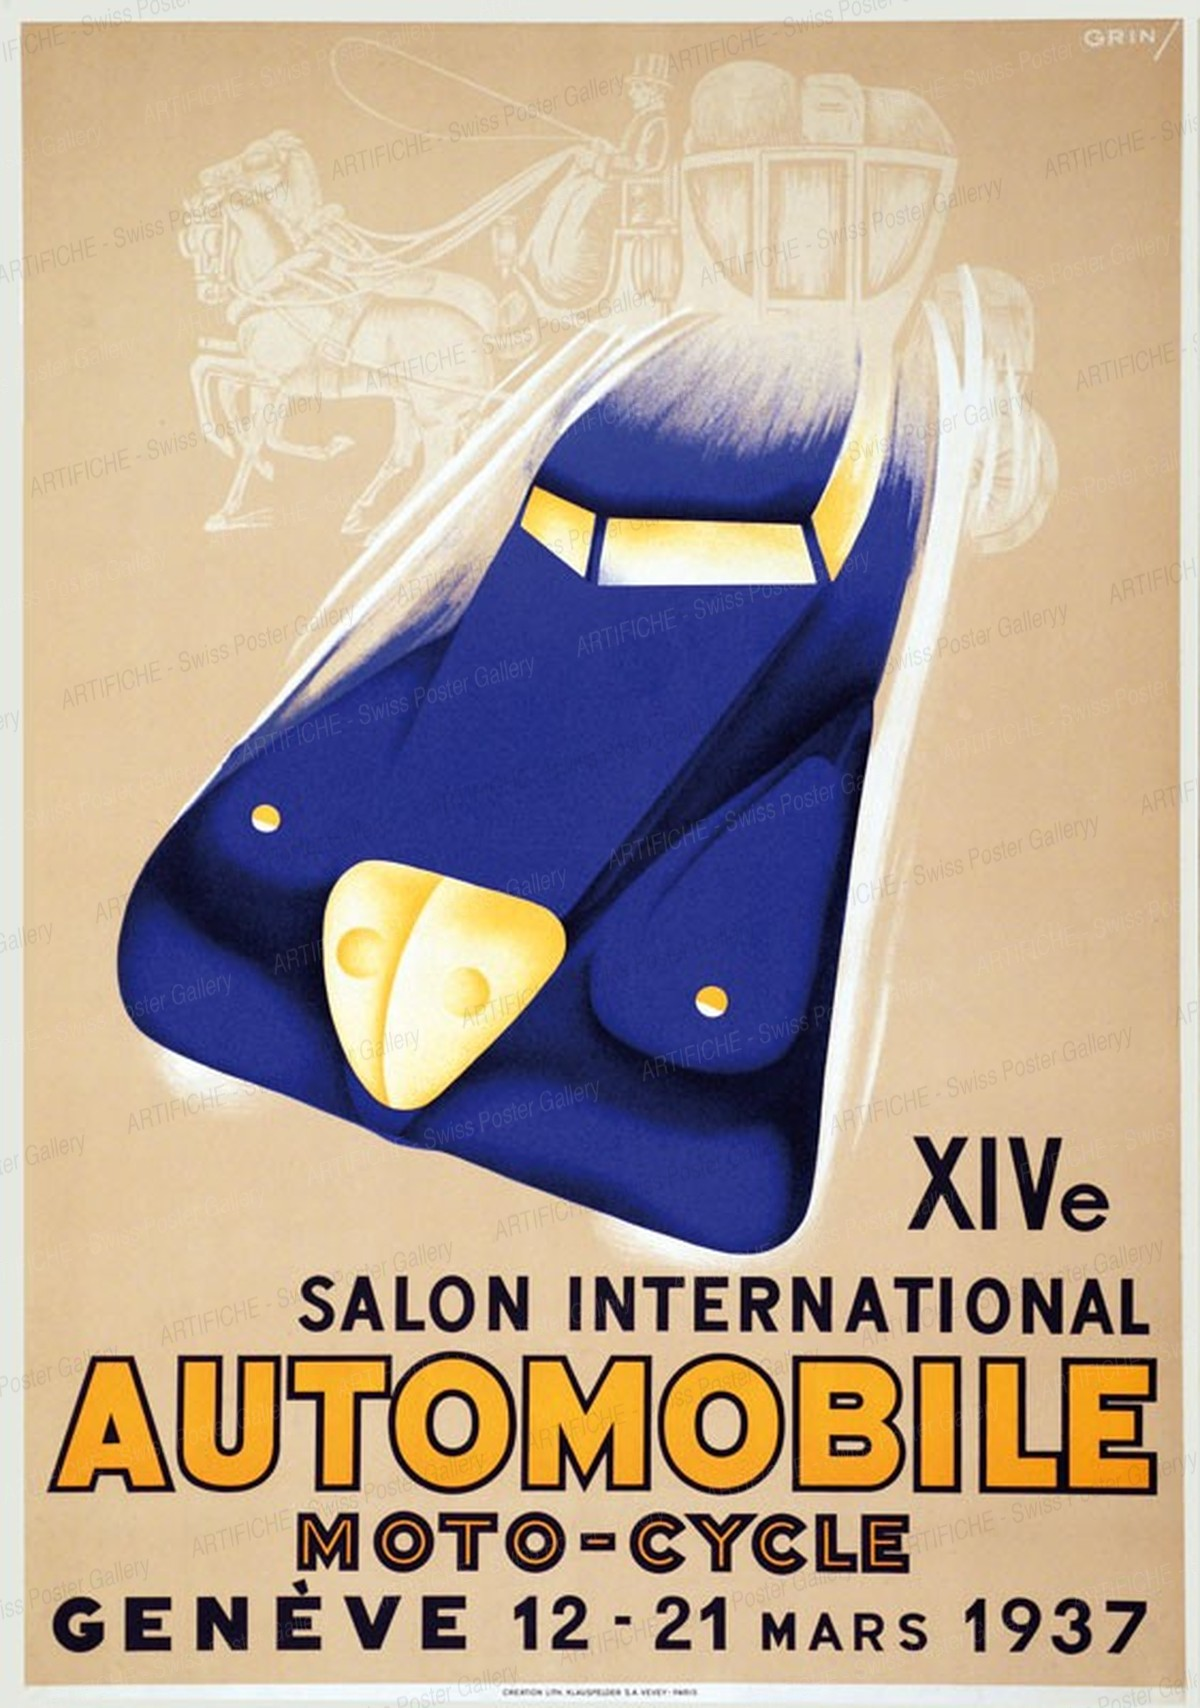 XIV. Salon International de l'Automobile Moto-Cycle Genève 1937, Edmond Grin